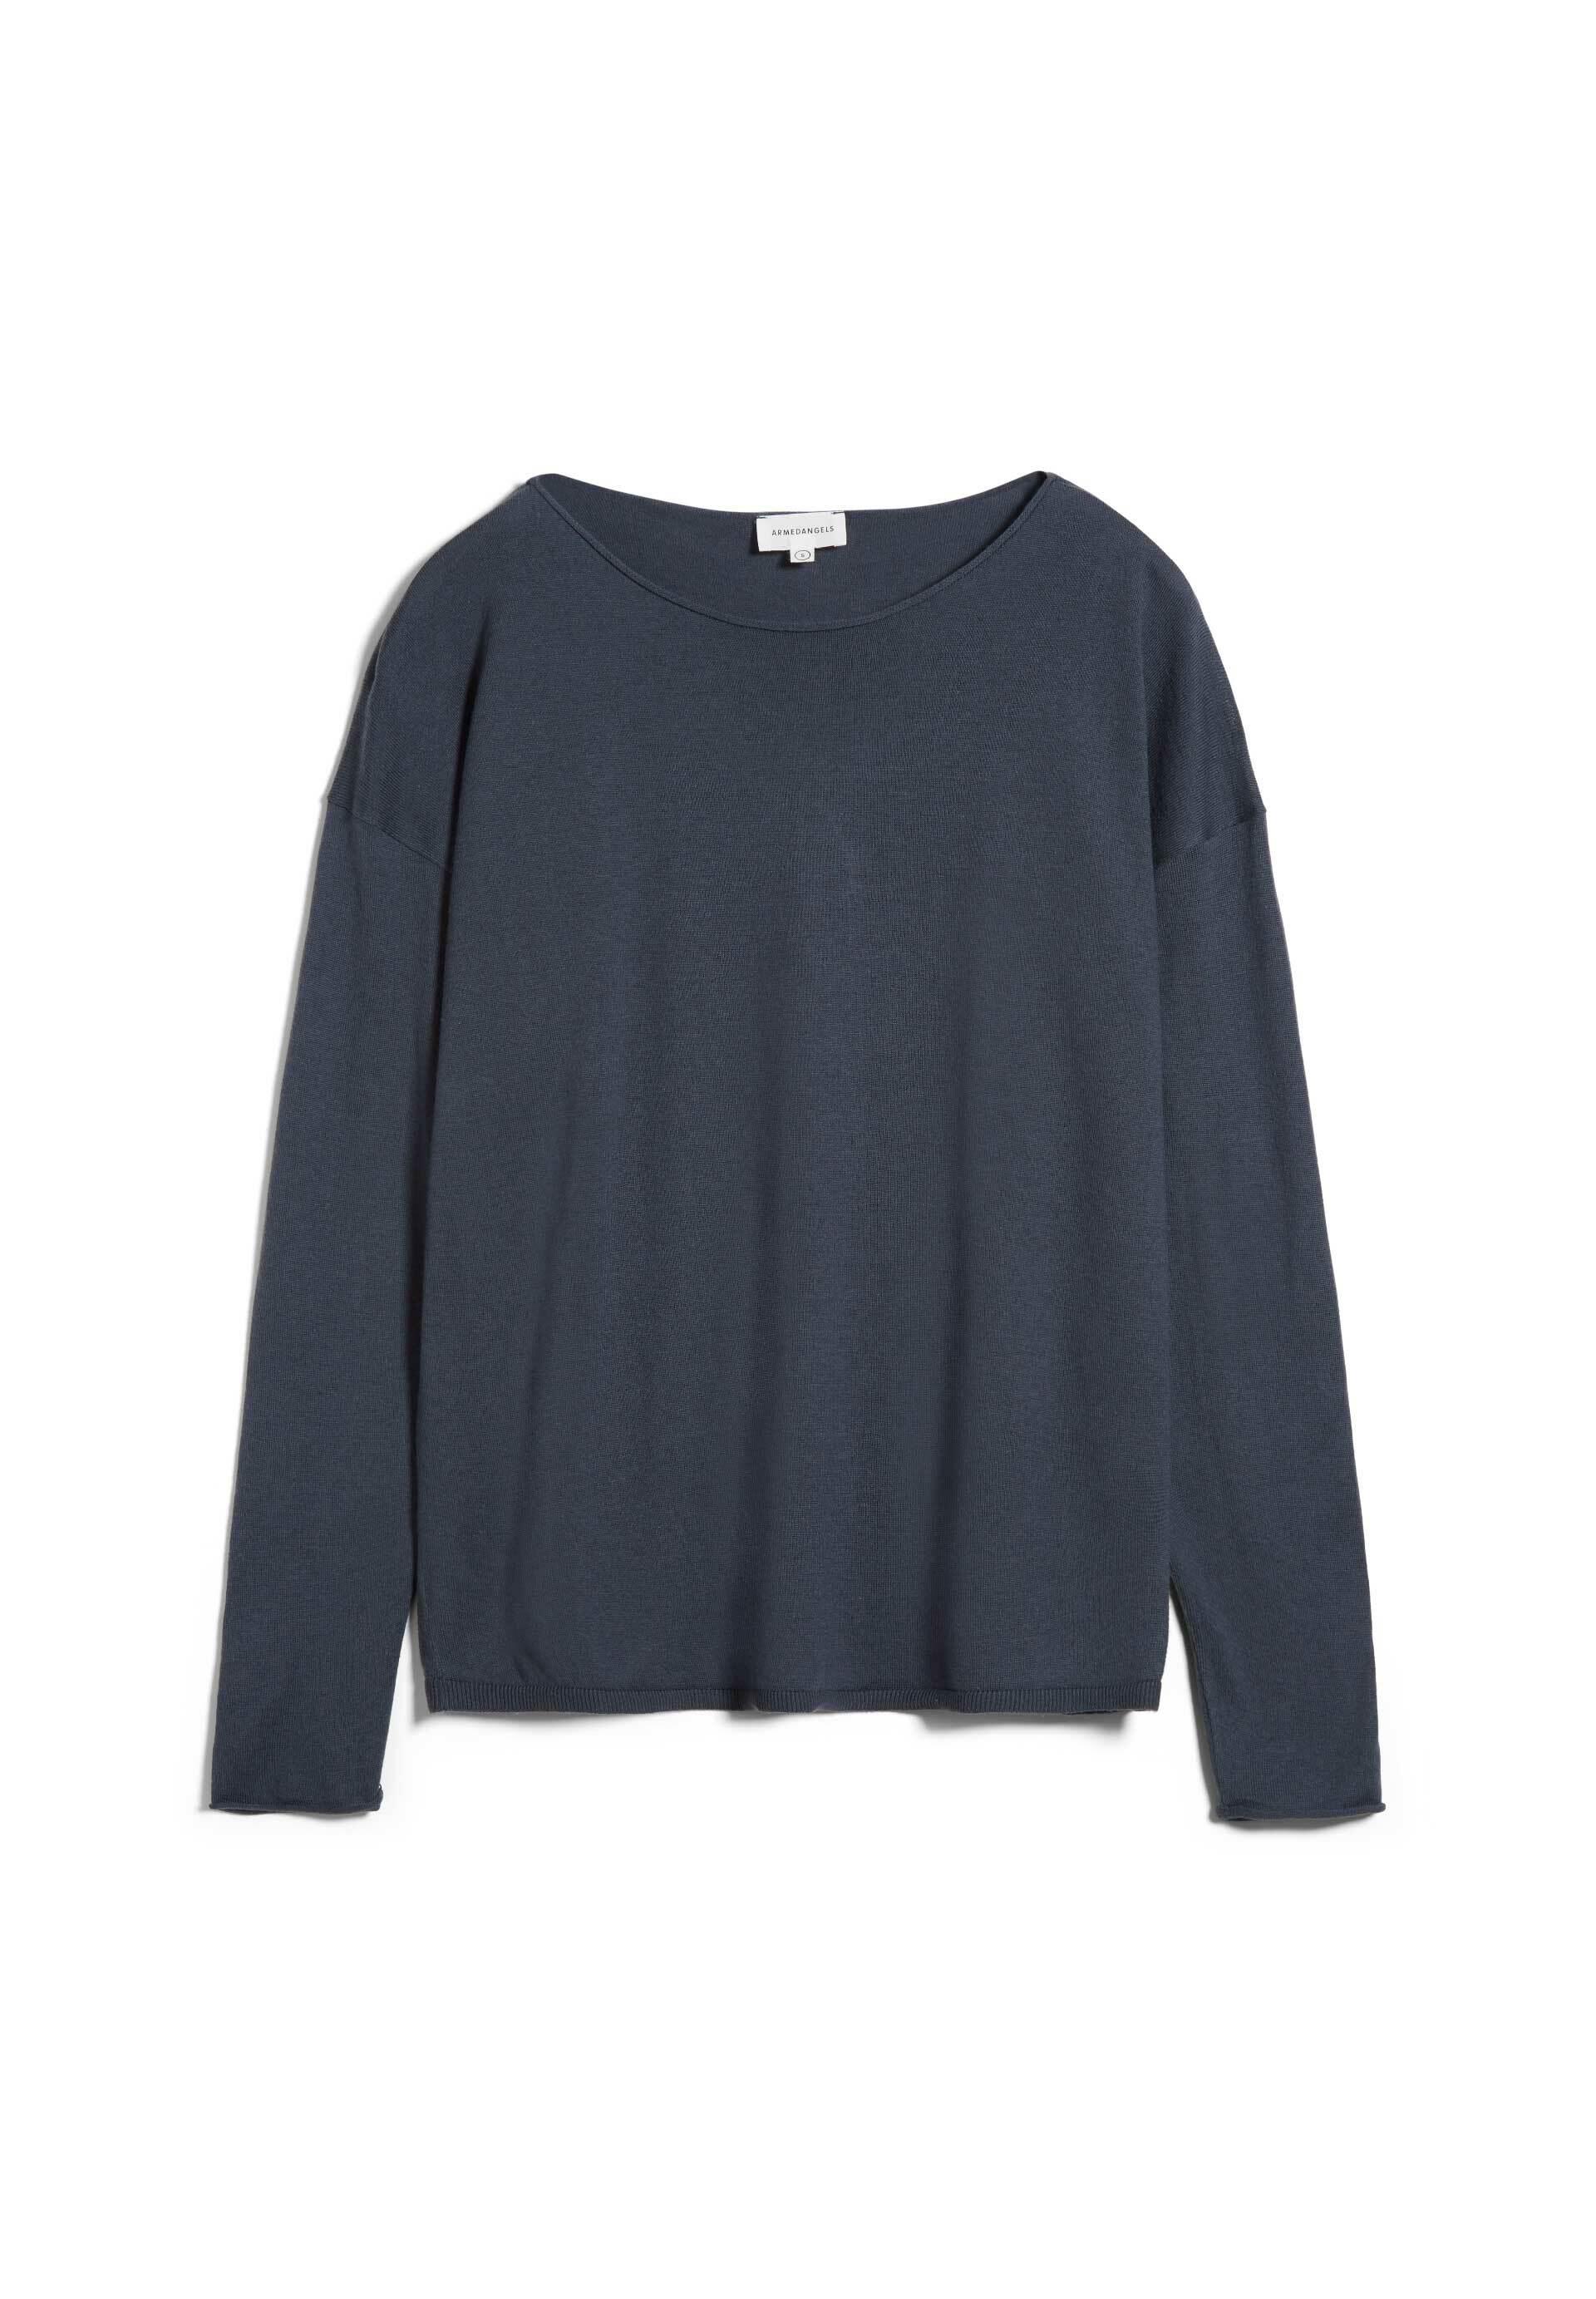 LADAA Pullover aus TENCEL™ Lyocell Mix